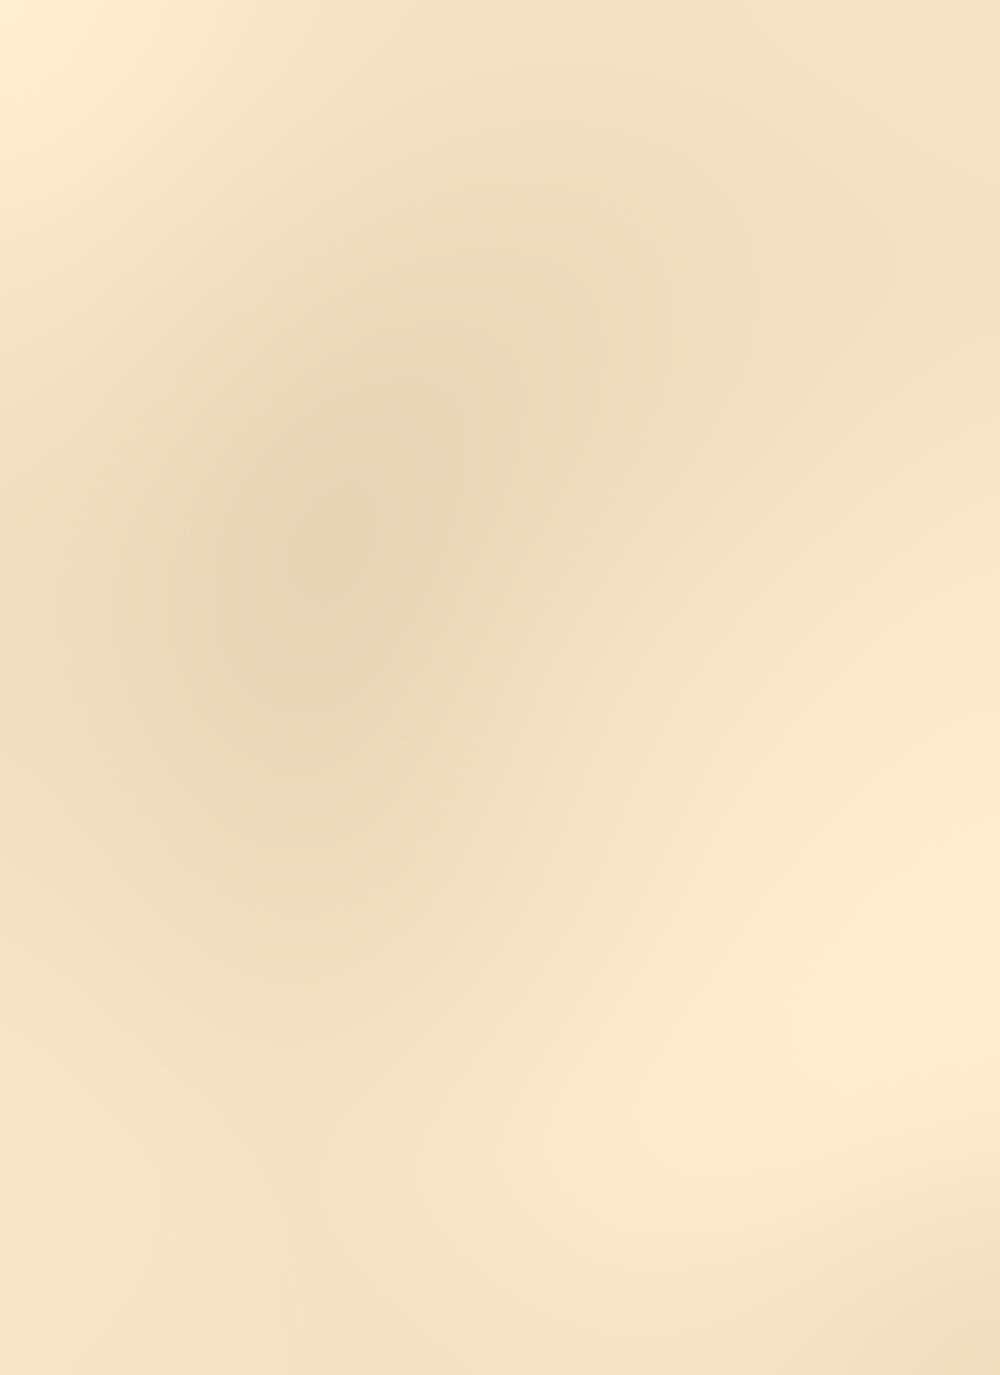 Devine Custard Deluxe Swatch 8-by-11